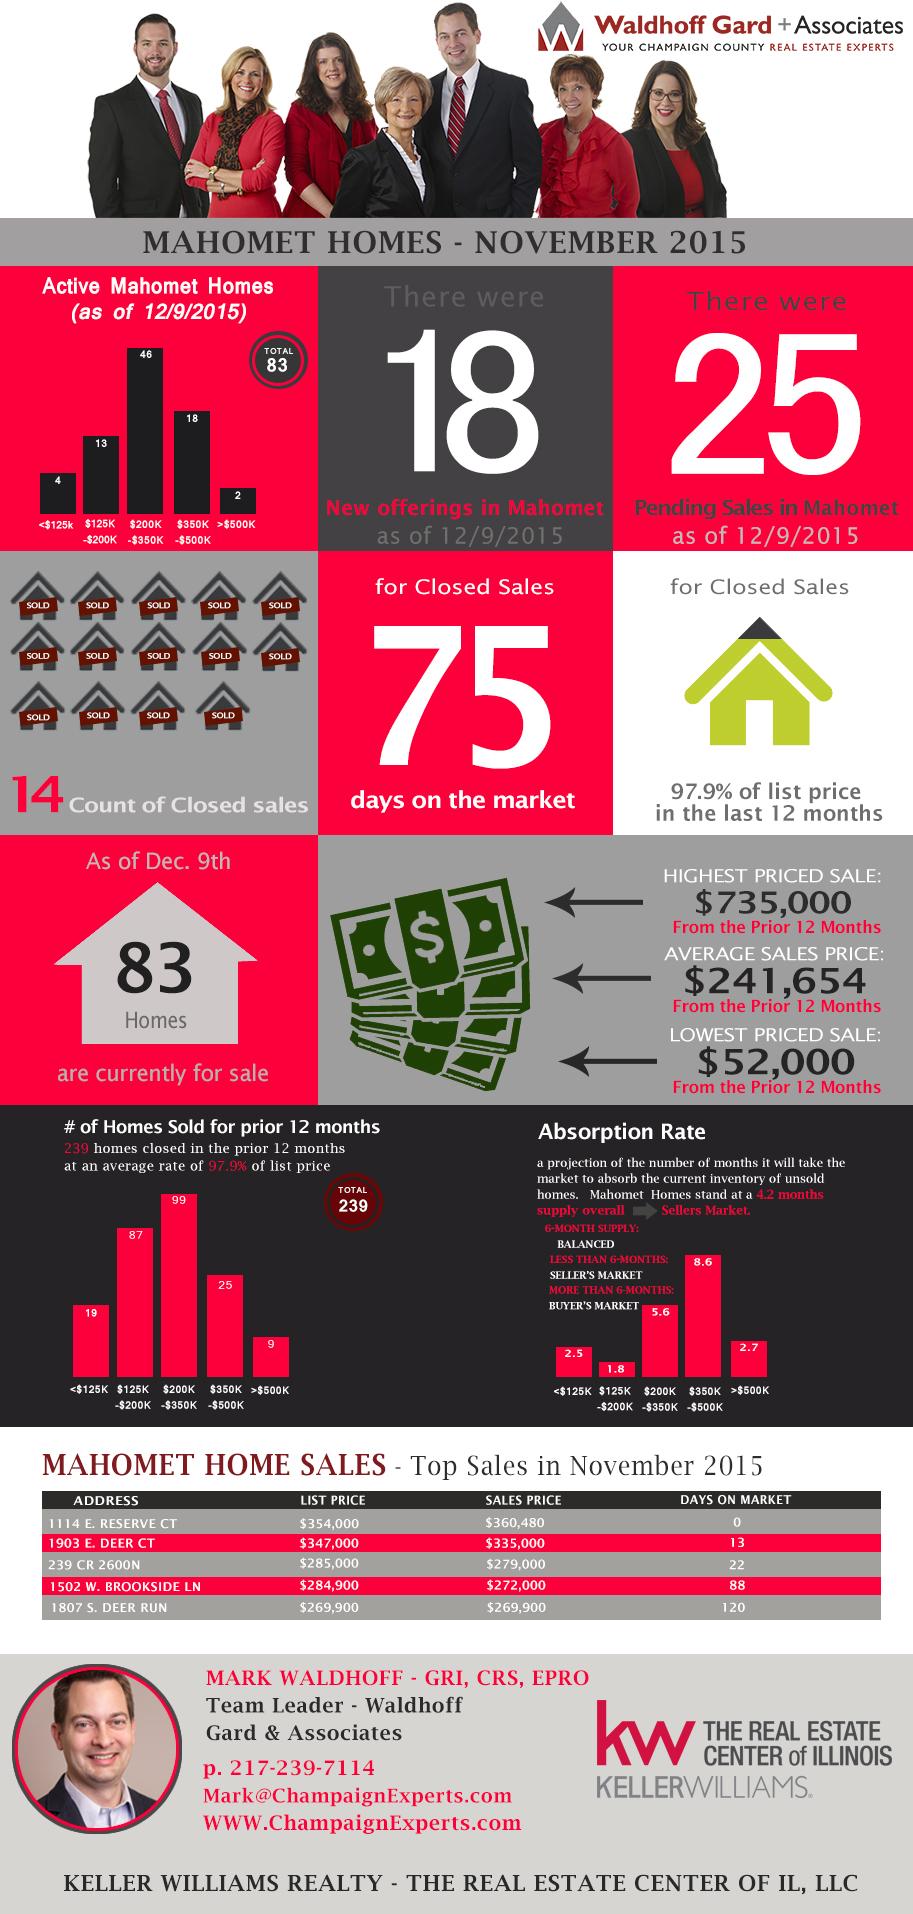 Mahomet Home Sales Infographic